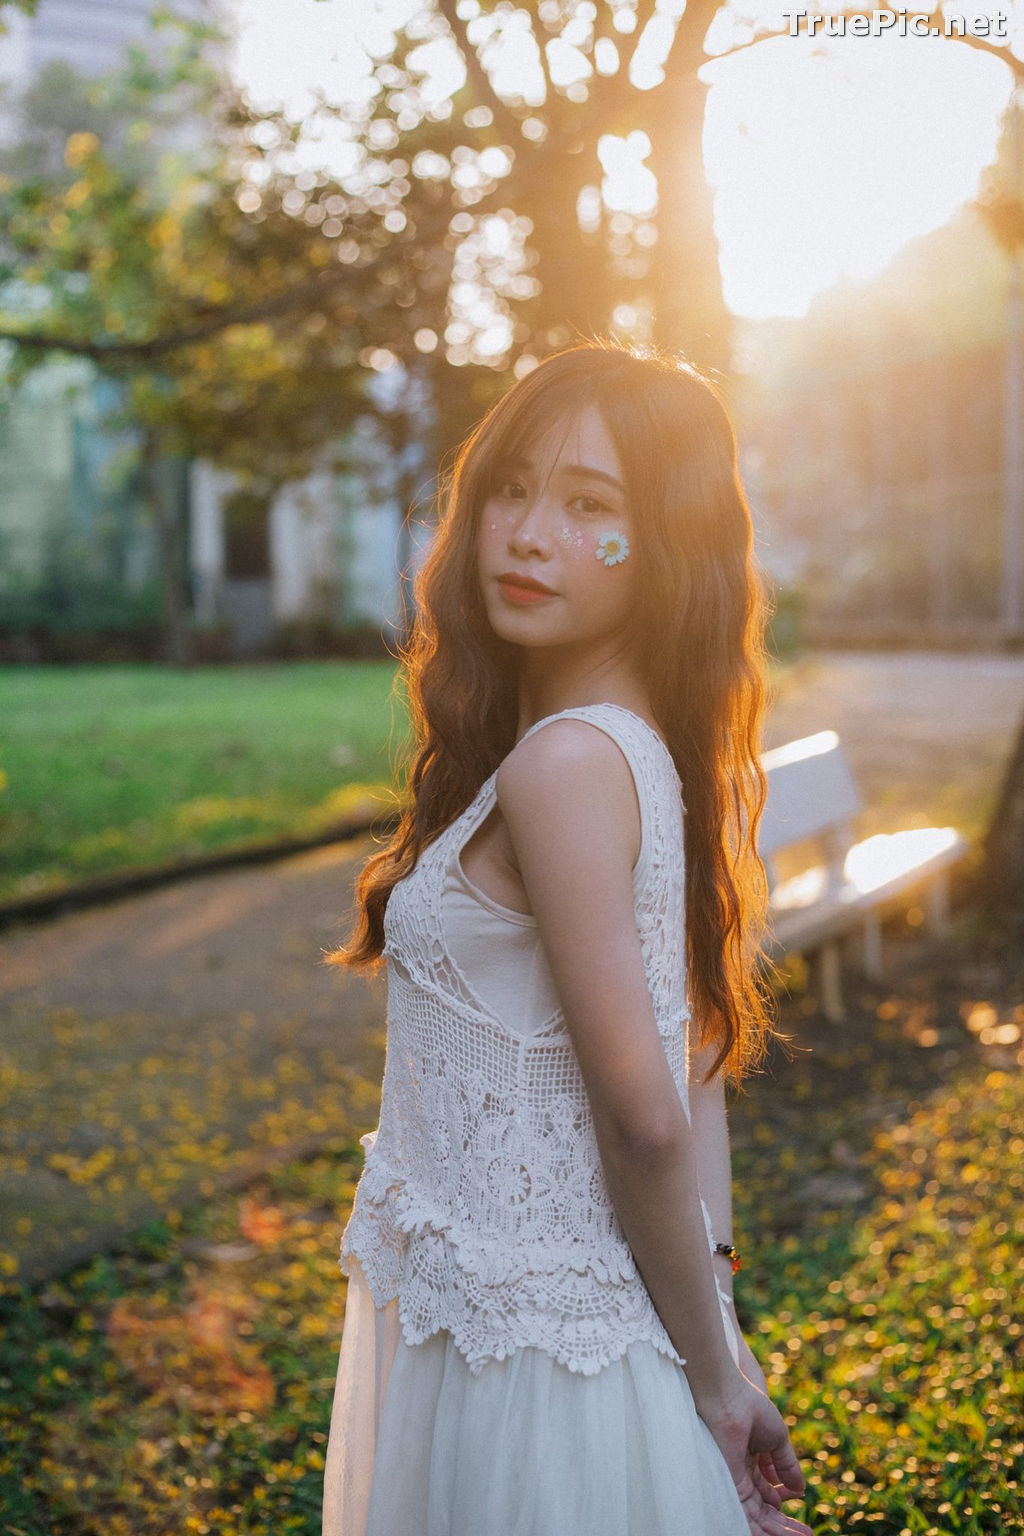 Image Vietnamese Model - Nguyen Phuong Dung - Hot Girls Ads - TruePic.net - Picture-3